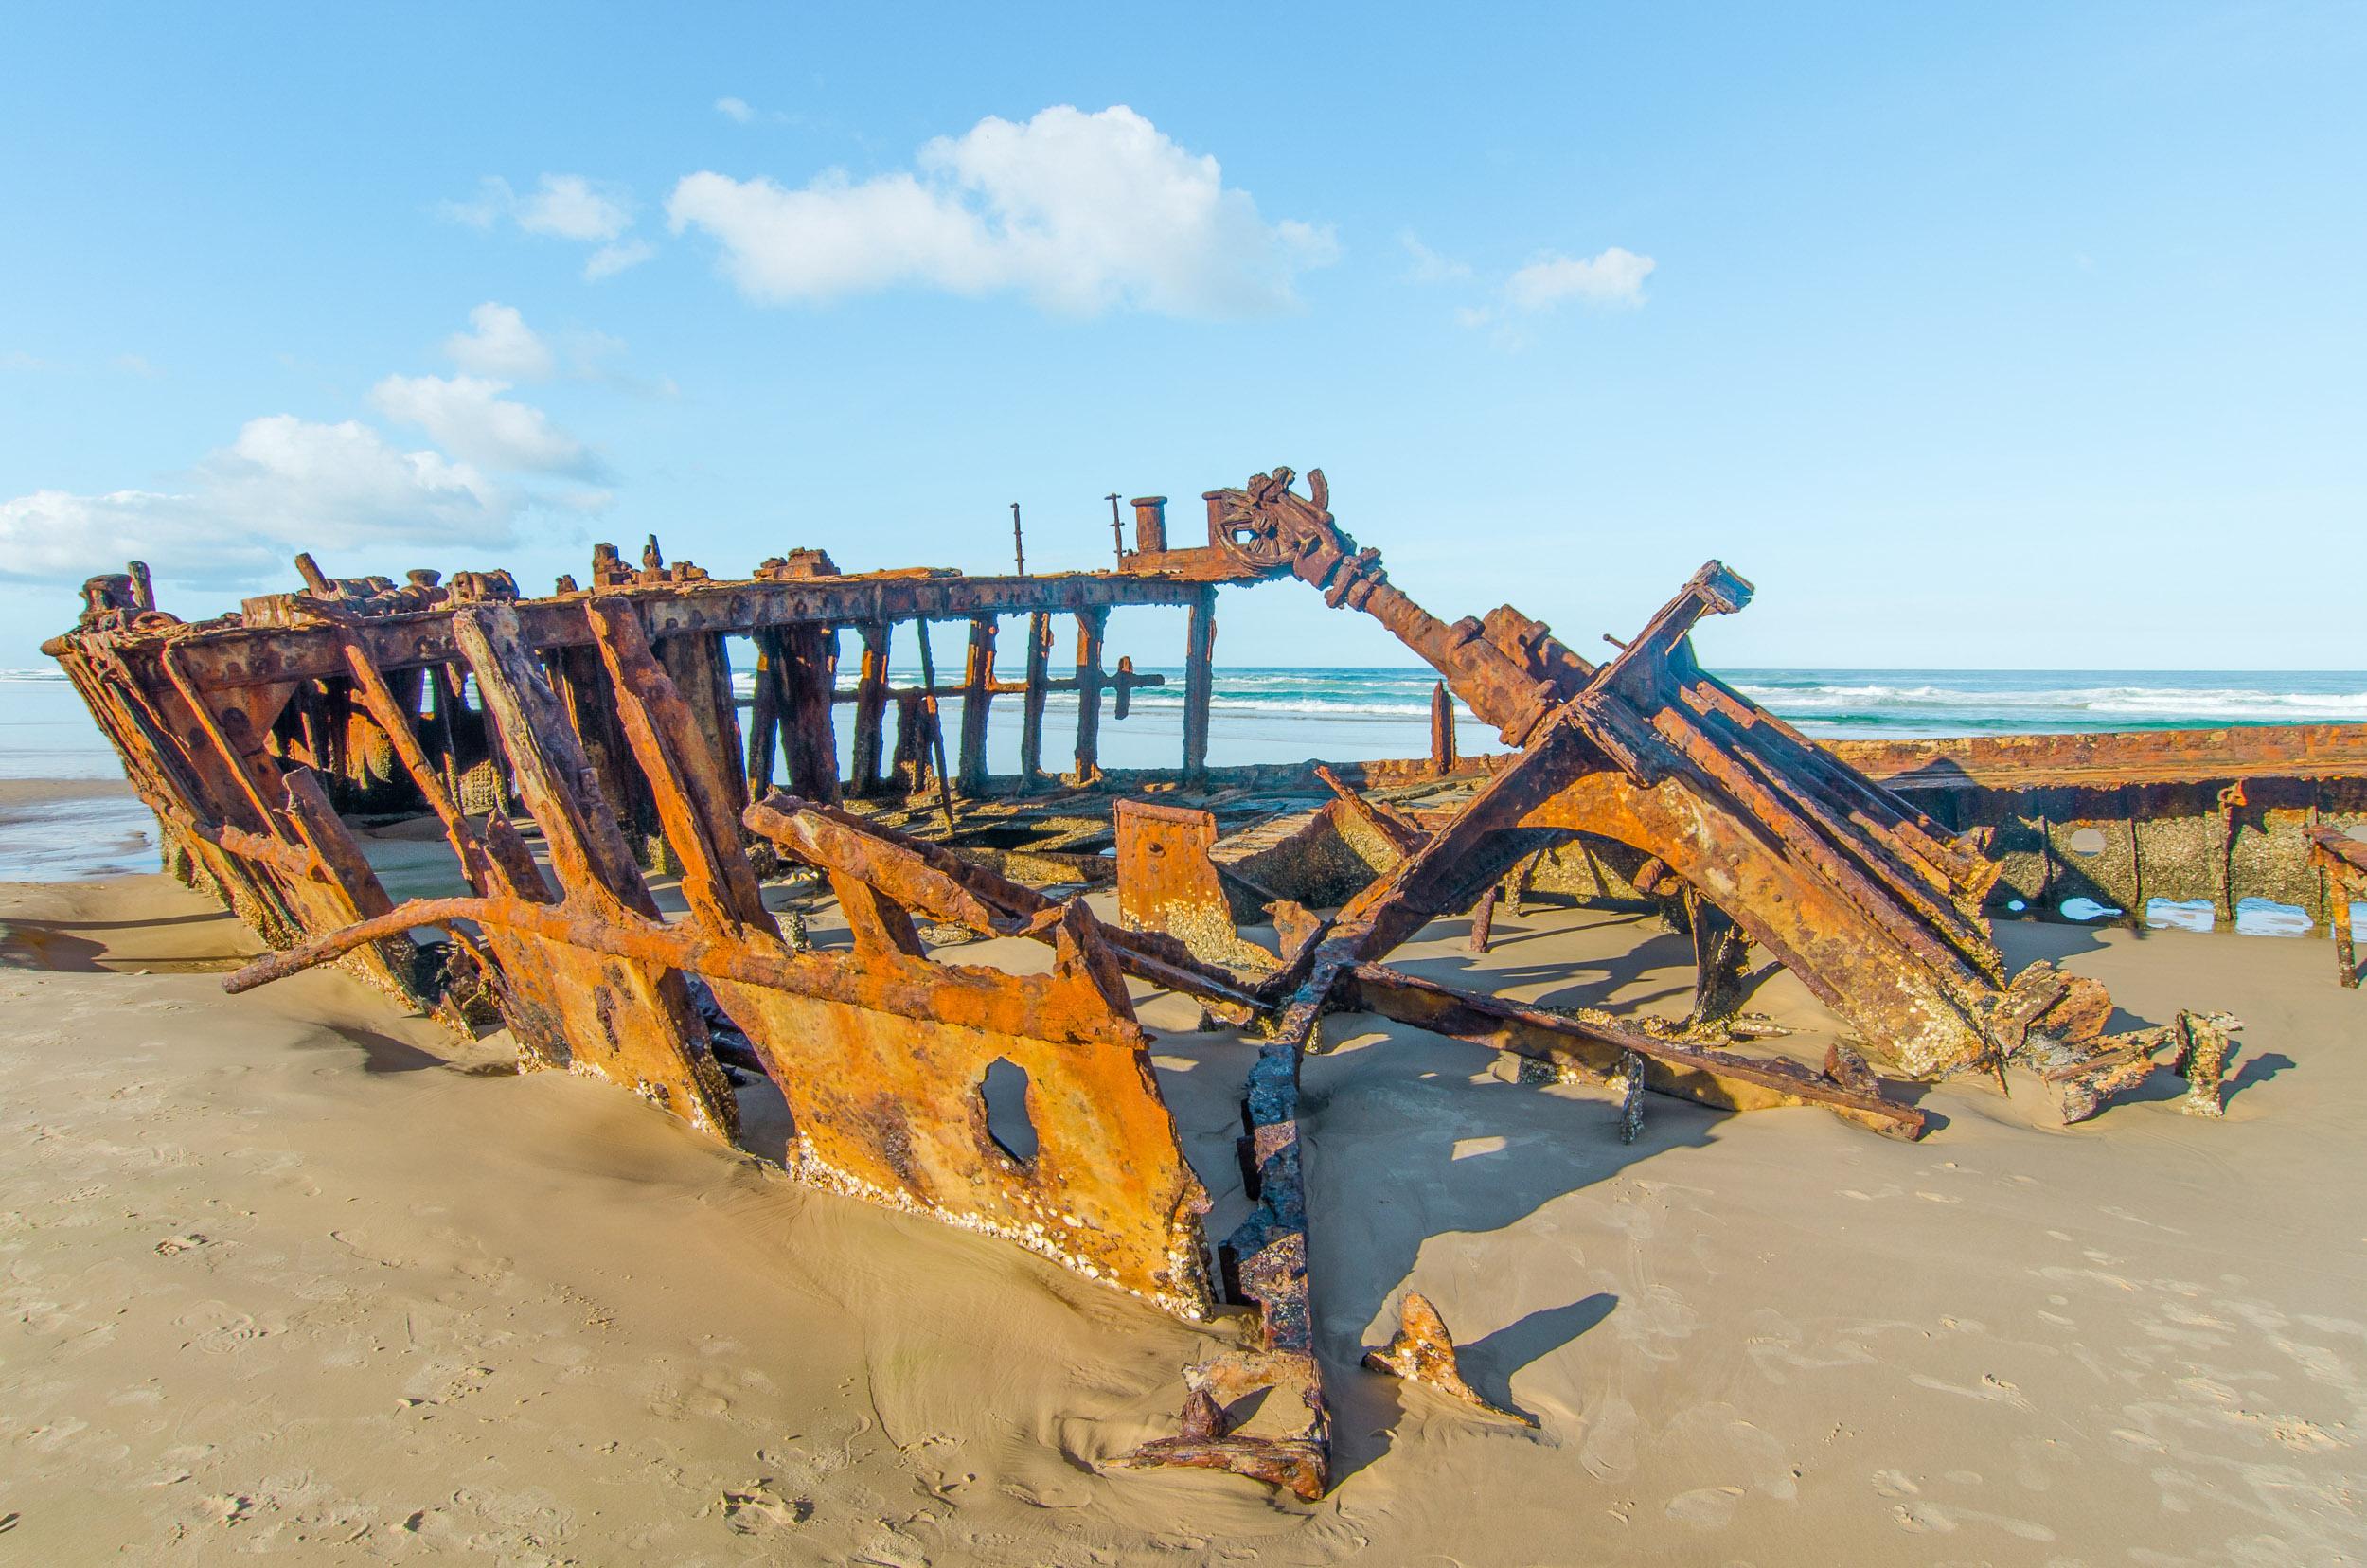 maheno shipwreck visiter fraser island